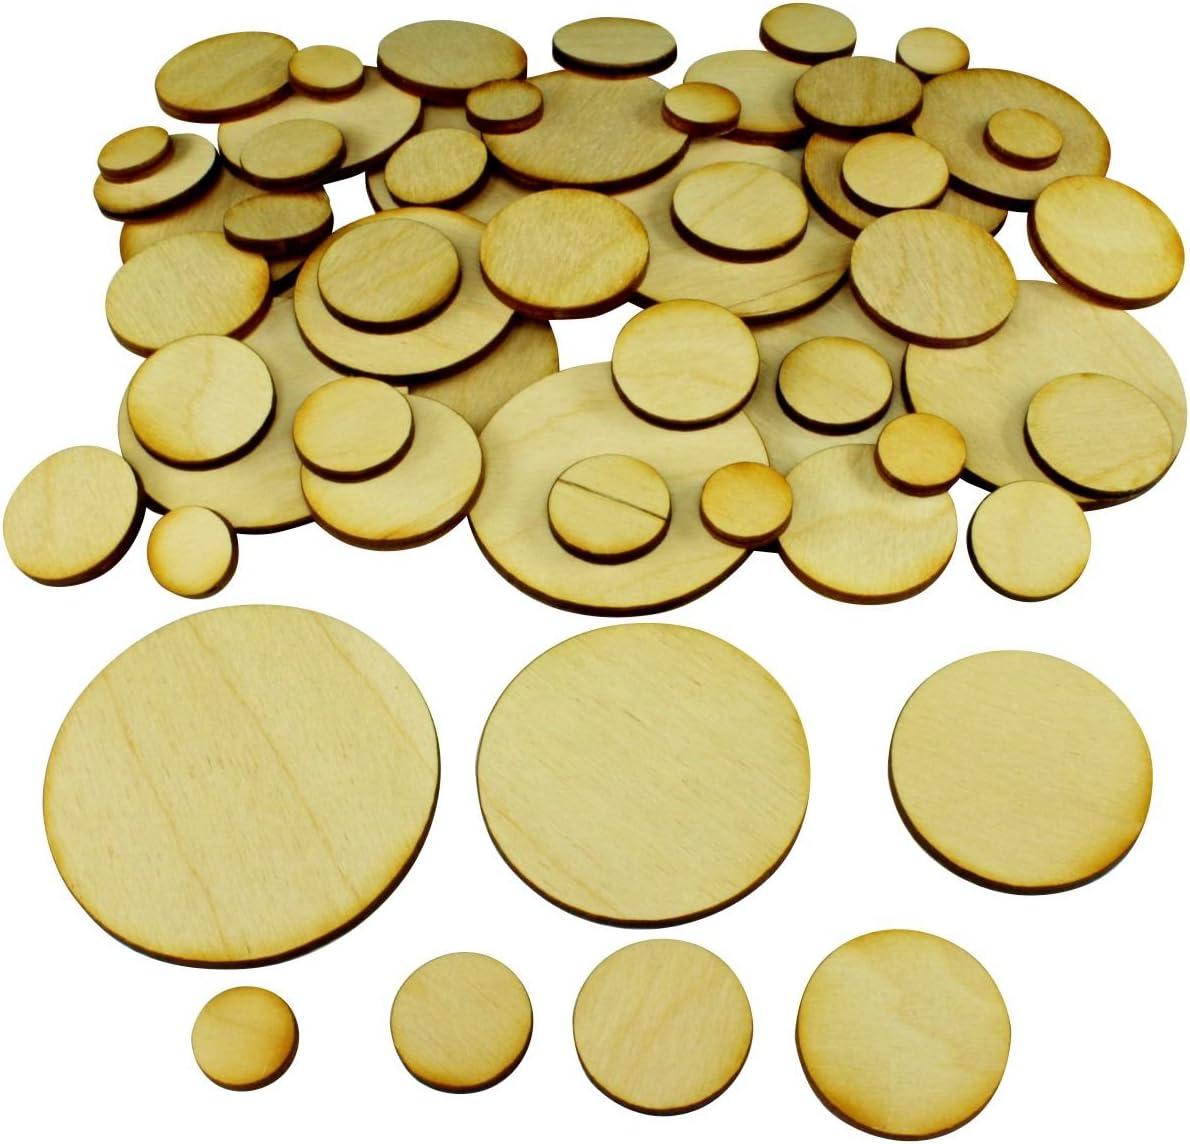 LITKO Miniature Bases, Circular Metric Base Sampler, Laser Cut 3mm Plywood (56)